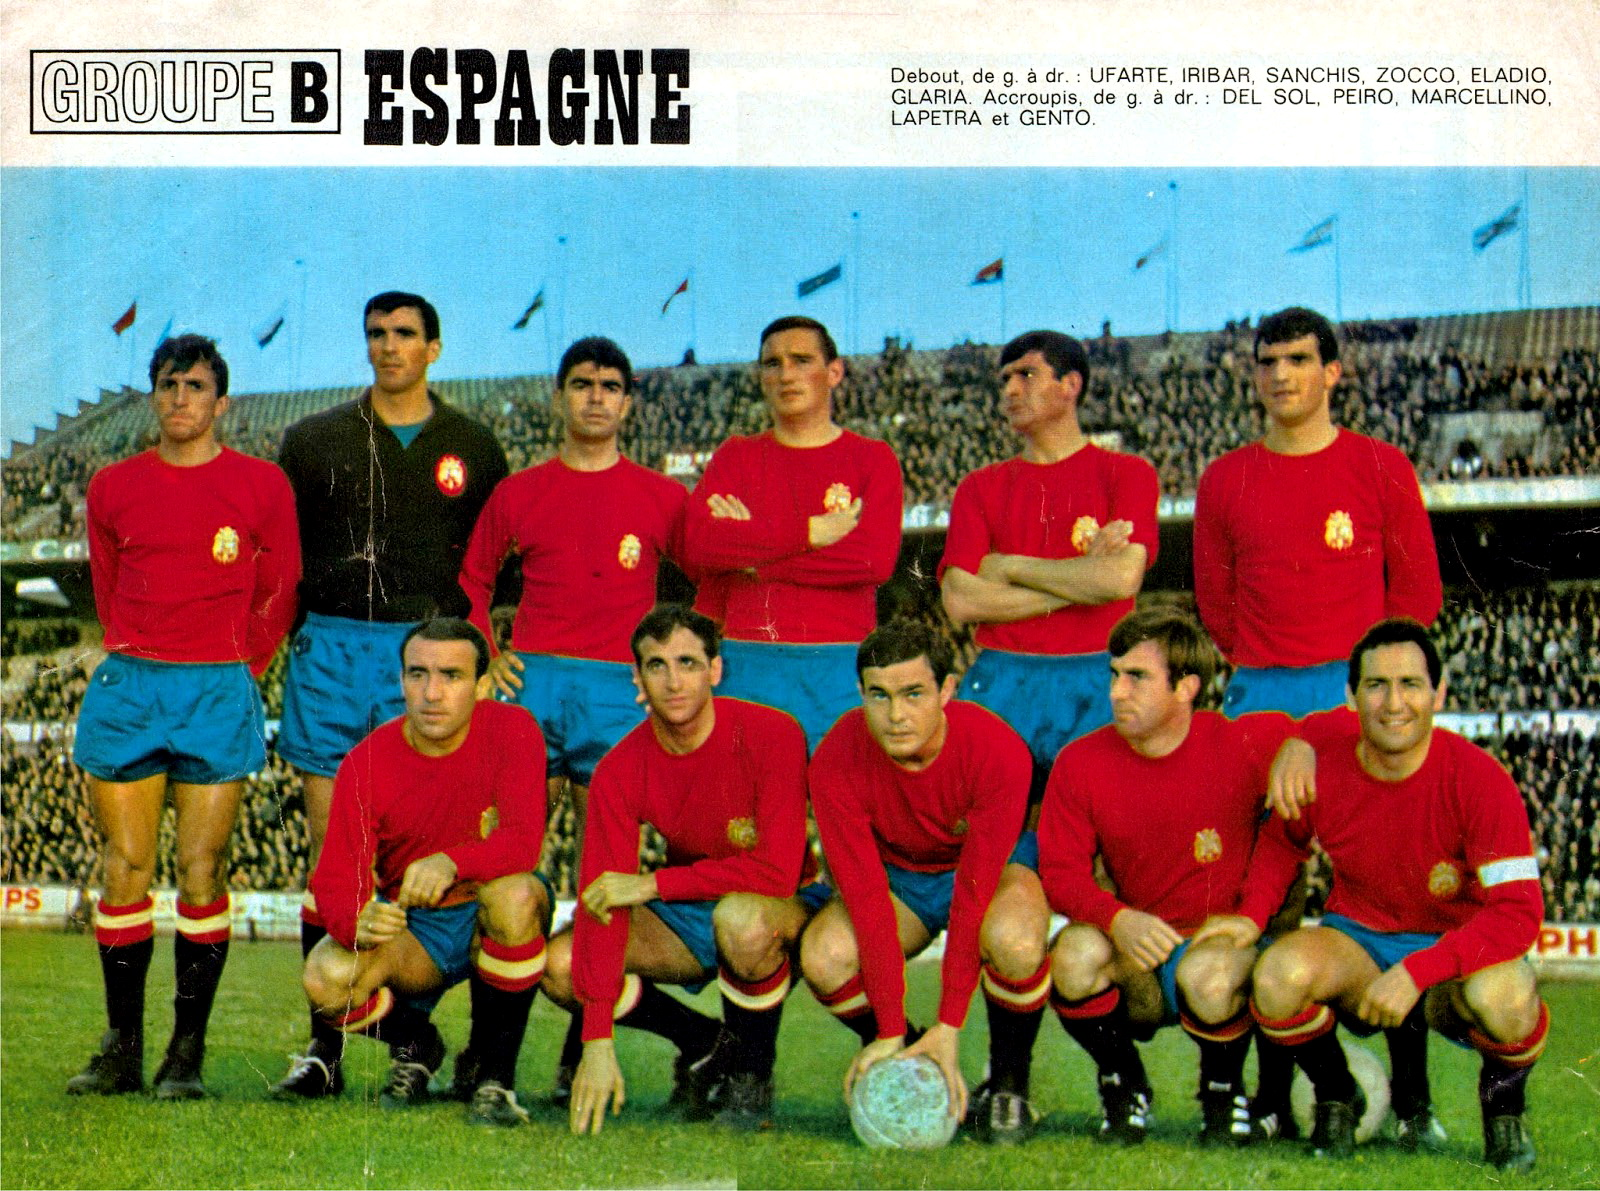 EQUIPOS DE FÚTBOL: SELECCIÓN DE ESPAÑA en la temporada 1965-66